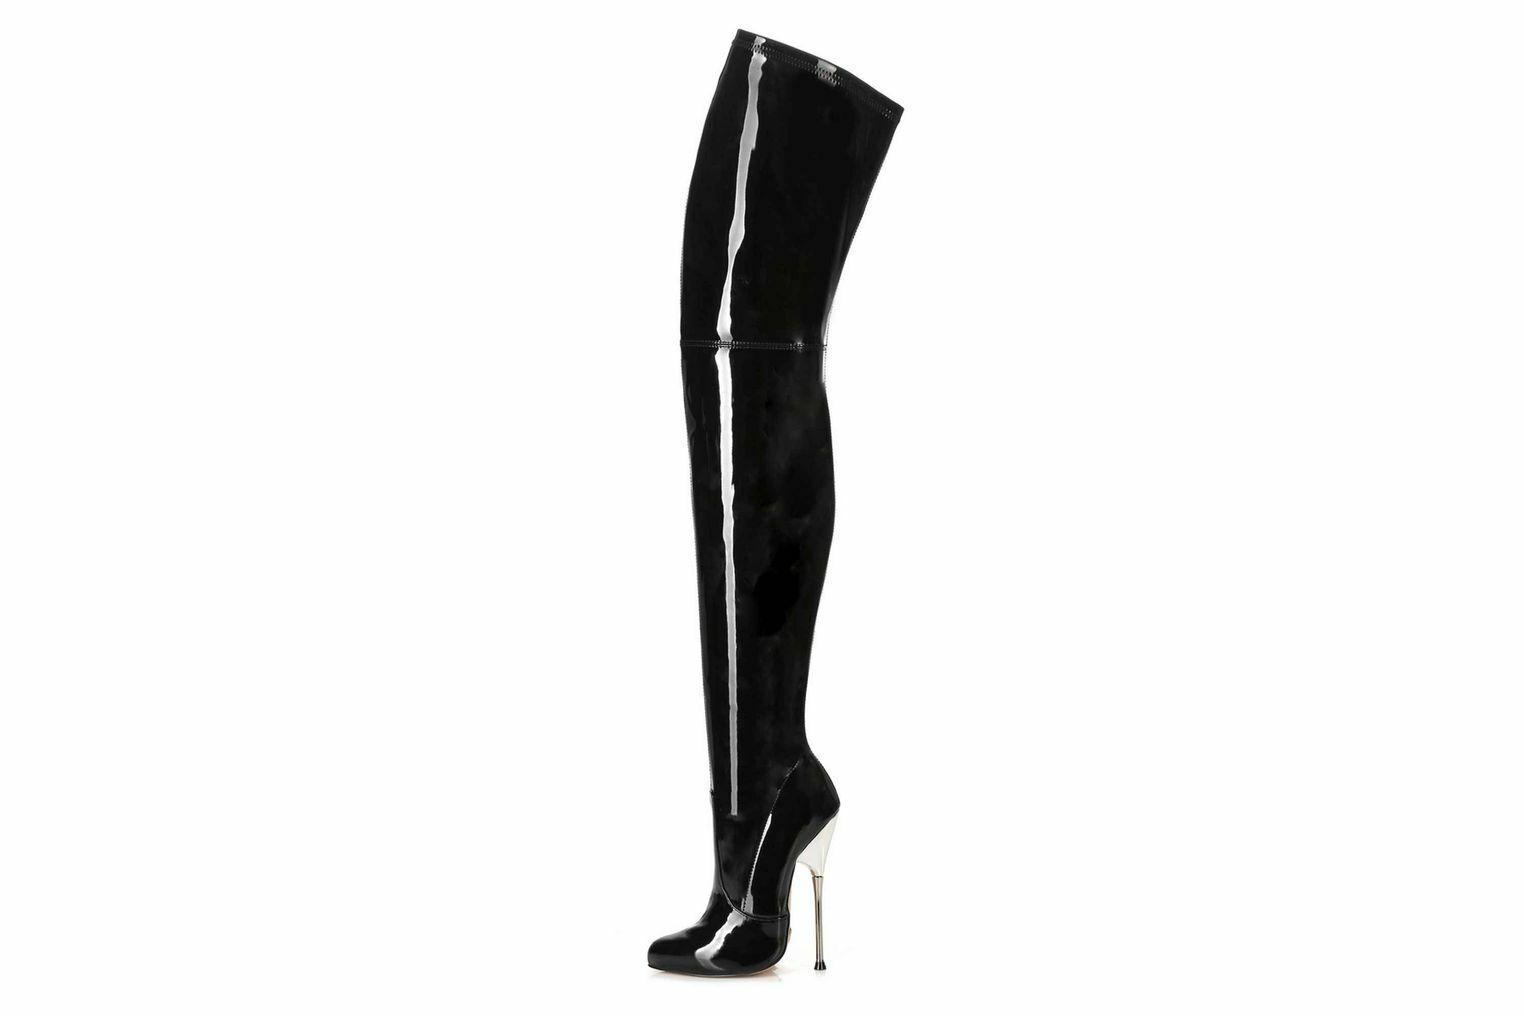 Giaro bigger negro Shiny botas en talla extragrande negro grandes zapatos señora